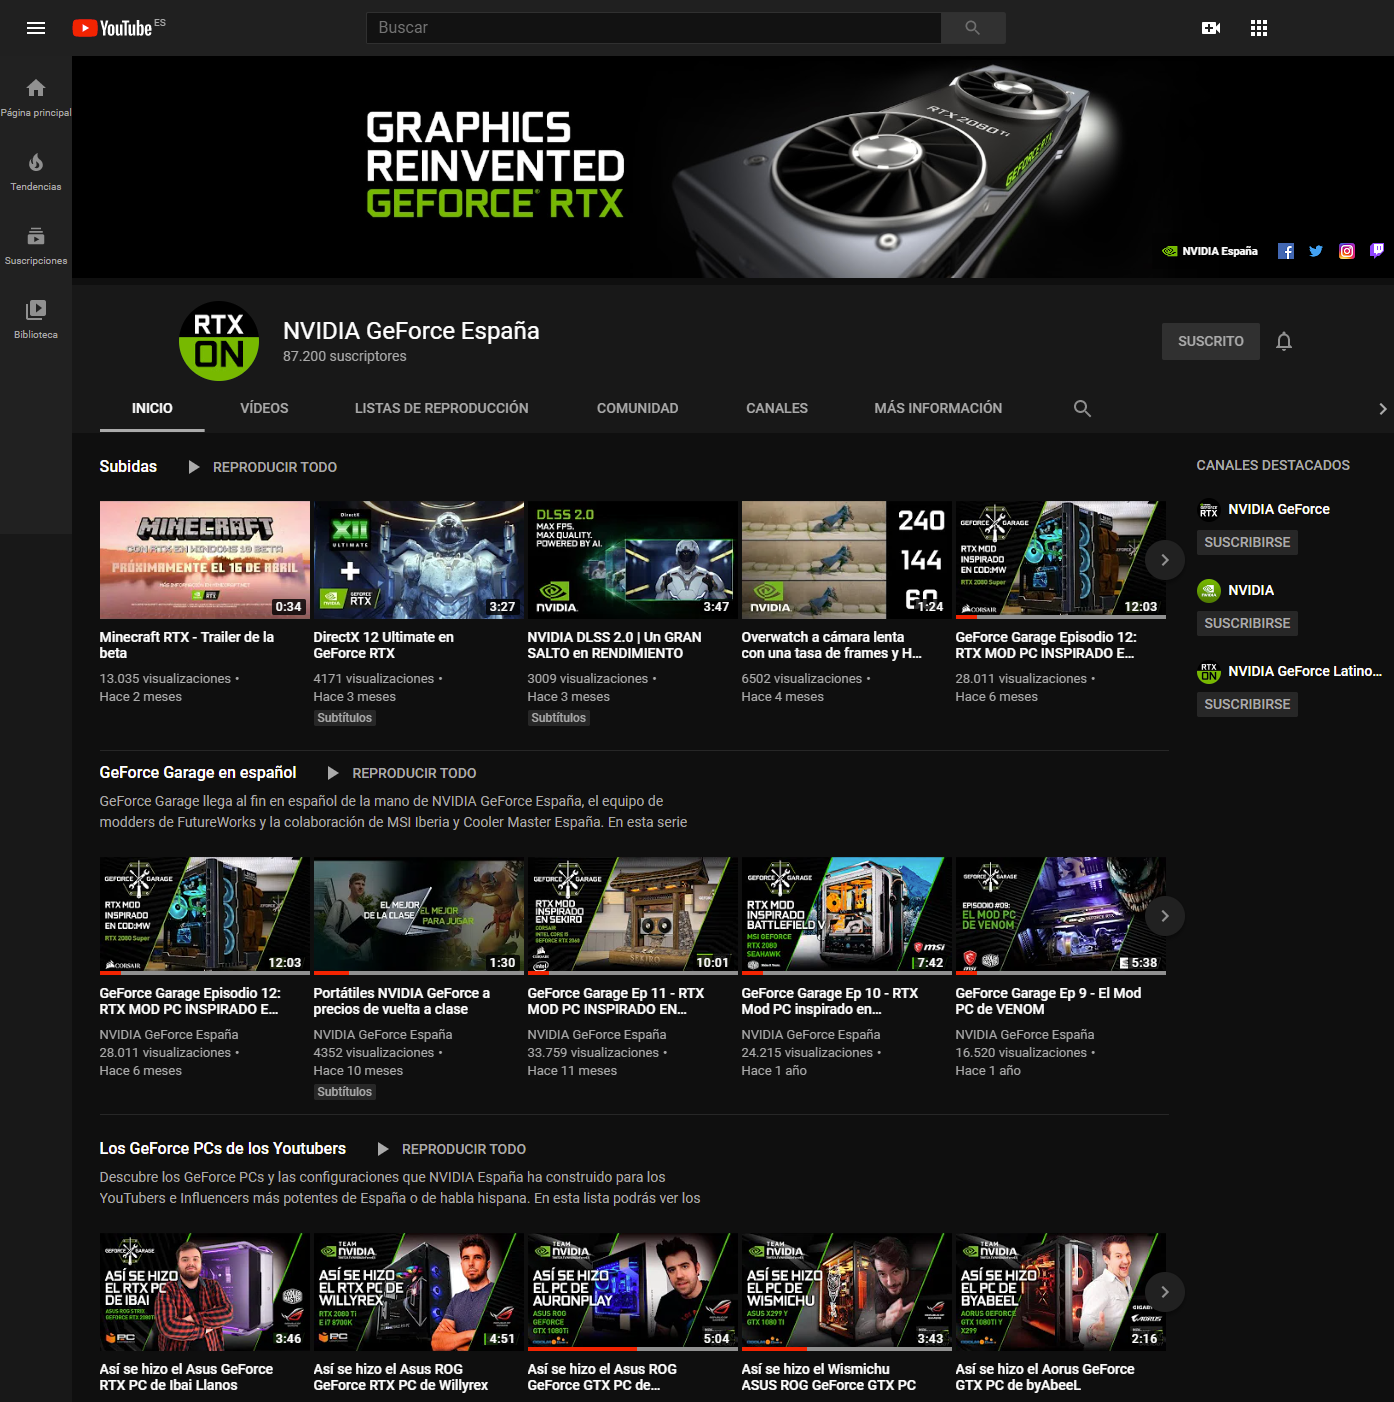 Canal NVIDIA GeForce España en YouTube